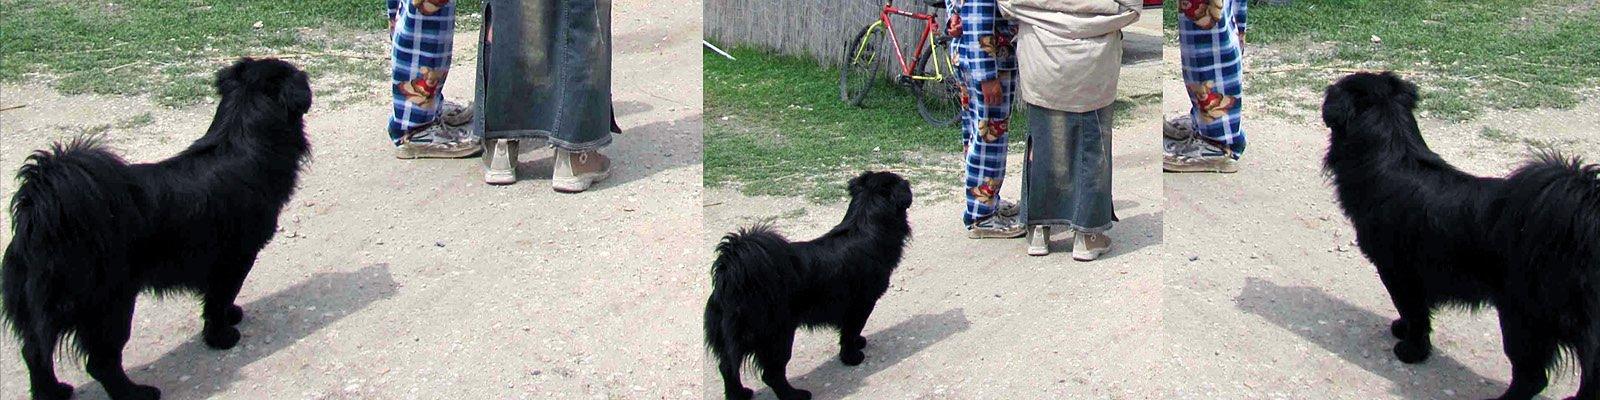 cagnolino zingaro